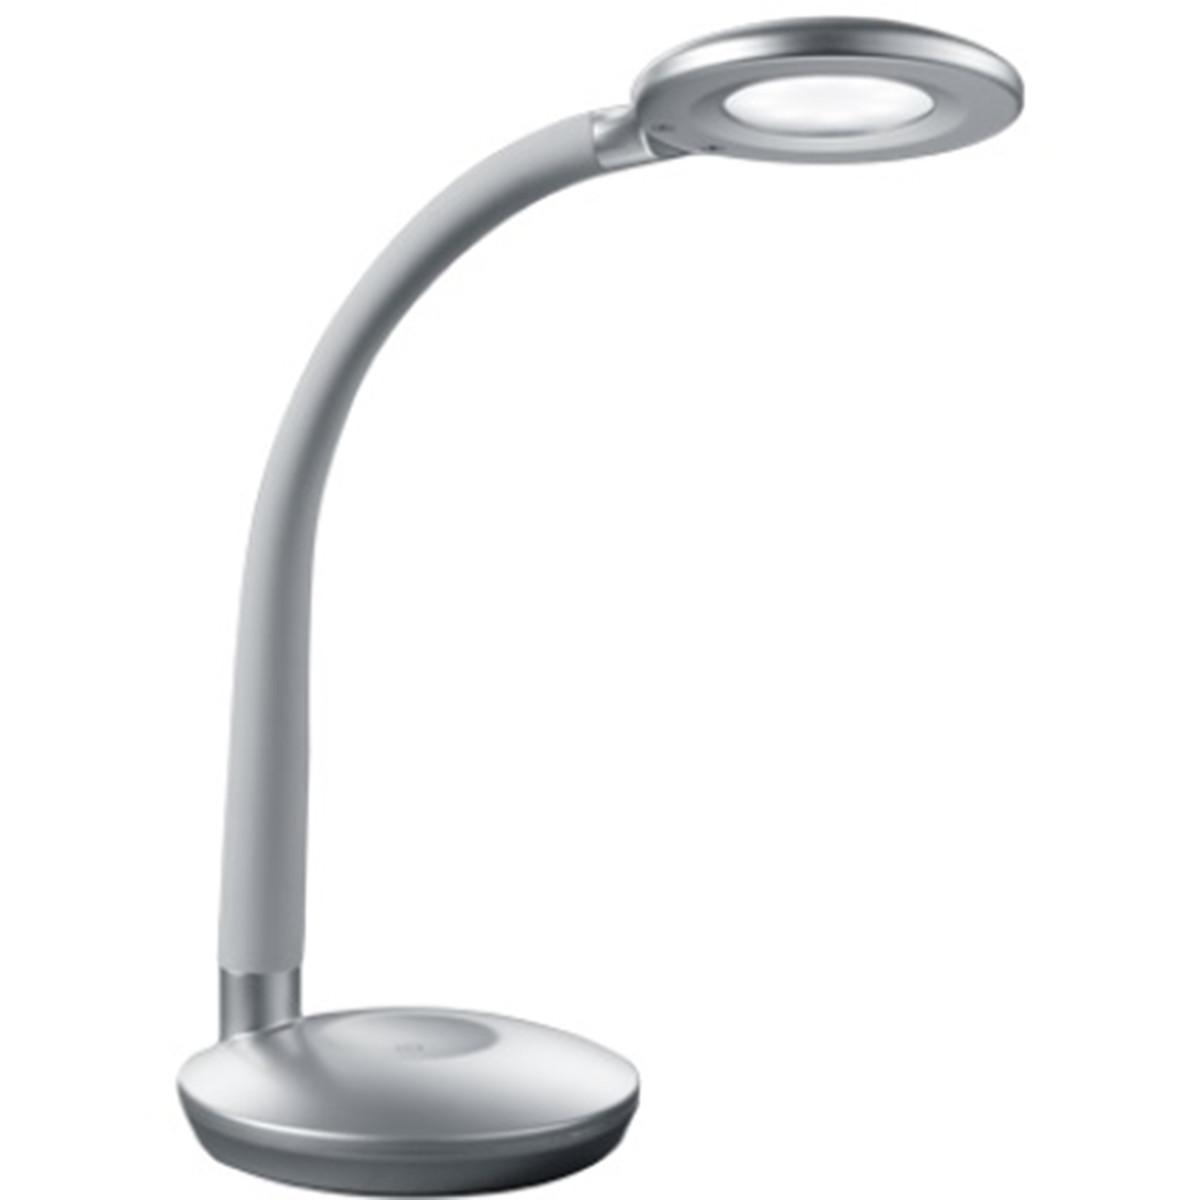 LED Tafellamp - Tafelverlichting - Trion Kori - 3W - Warm Wit 3000K - Rond - Mat